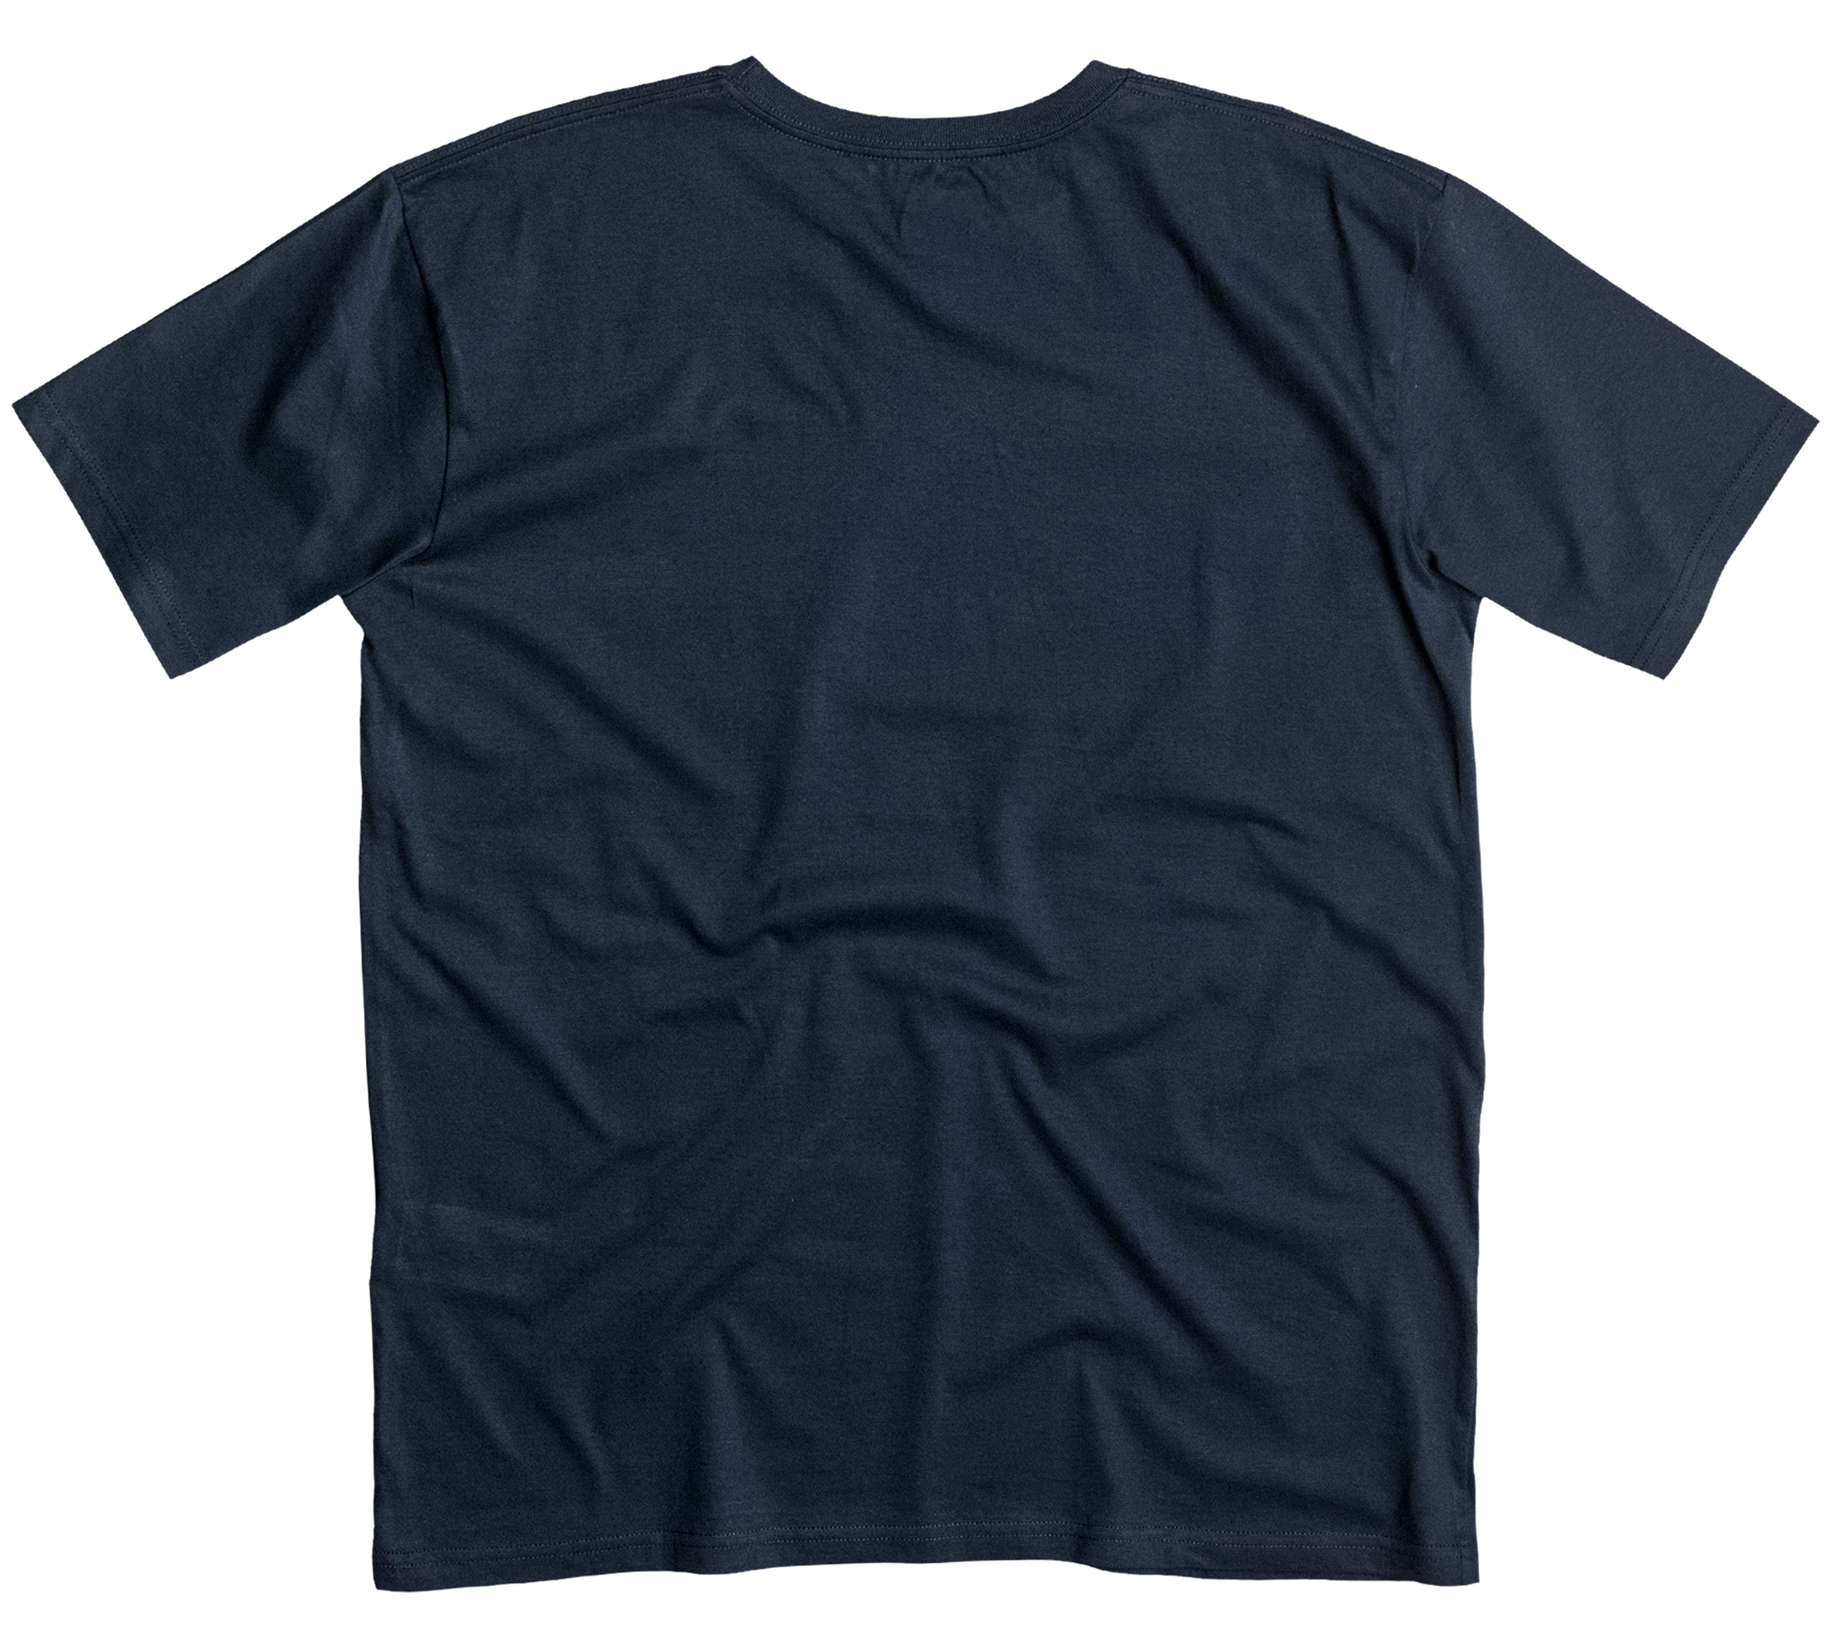 Koszulka Quiksilver Classic Extinguished (Navy Blazer) Ss16